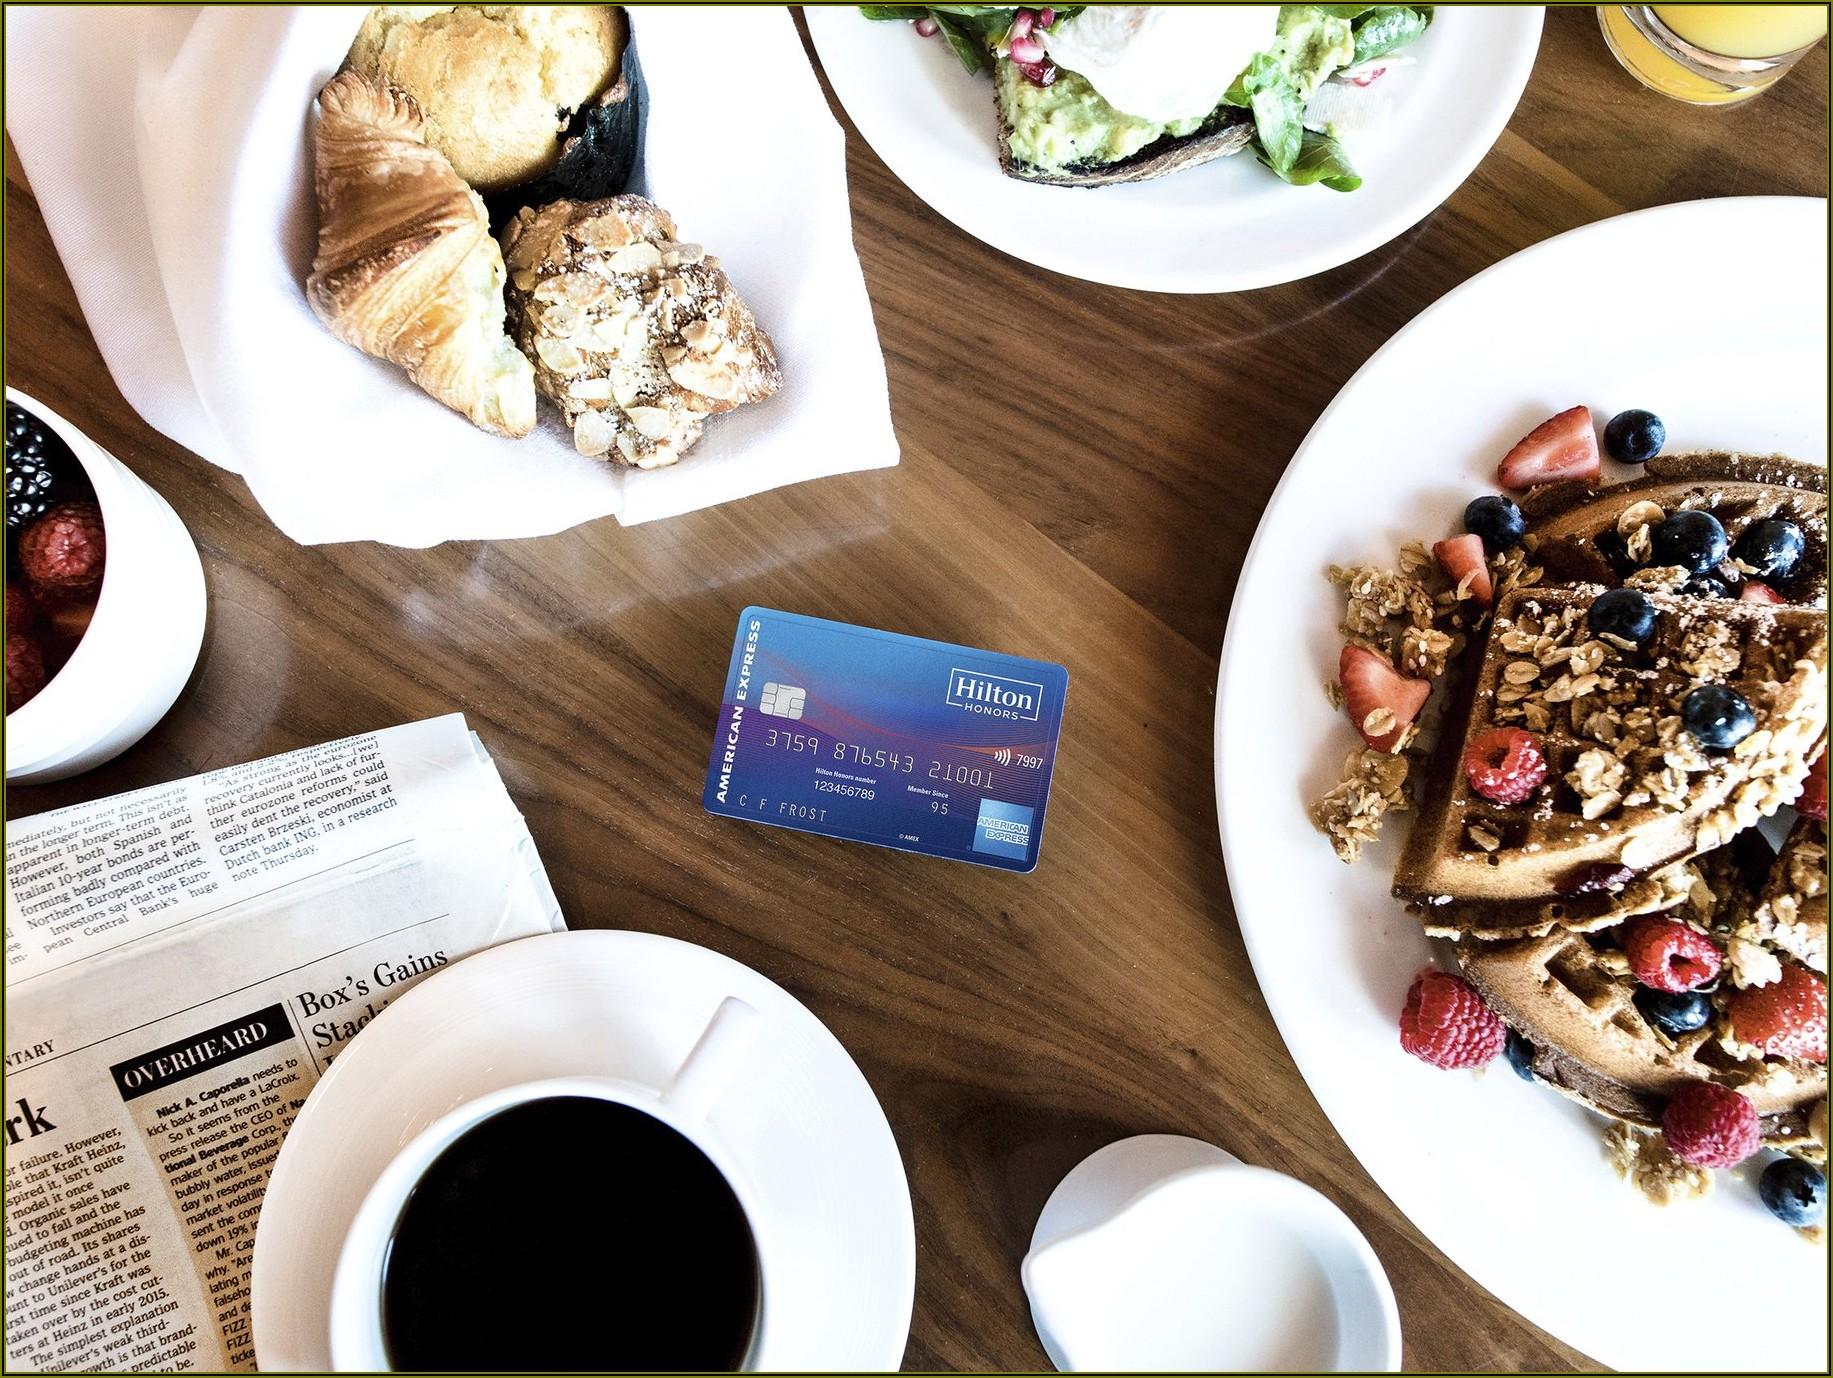 Hilton Business Card Review